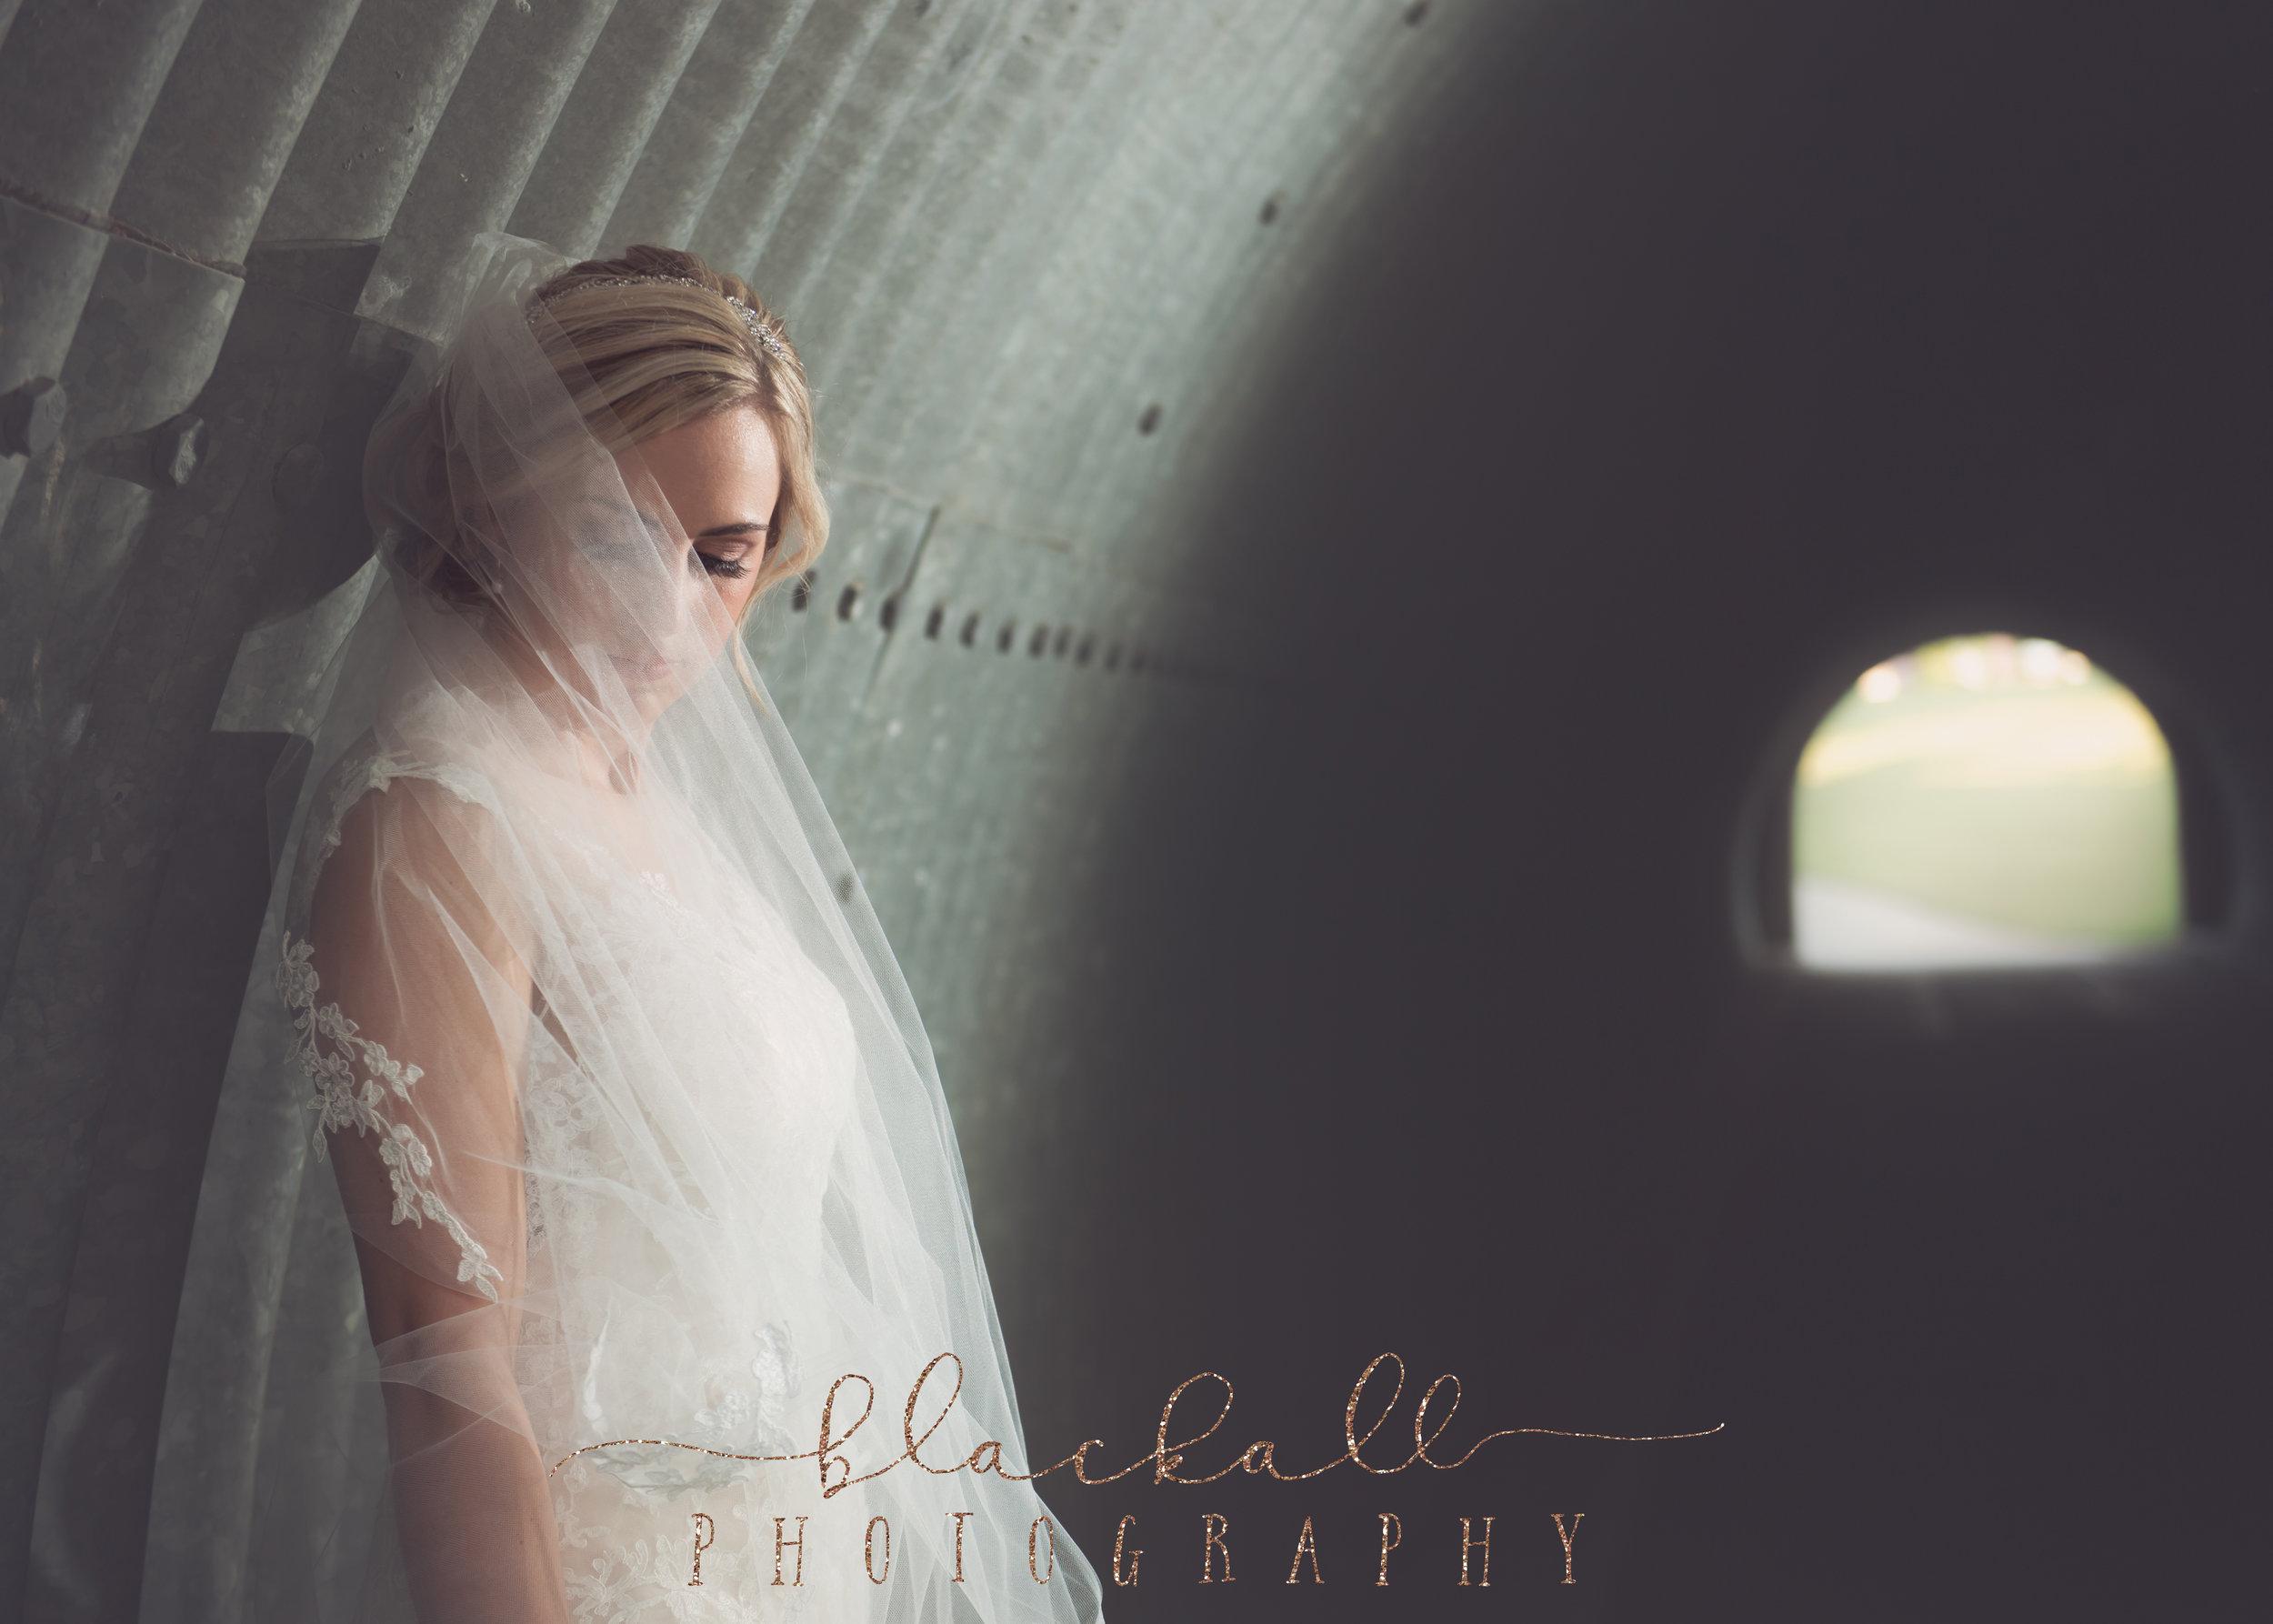 BRIDALS_Blackall Photography-43.jpg